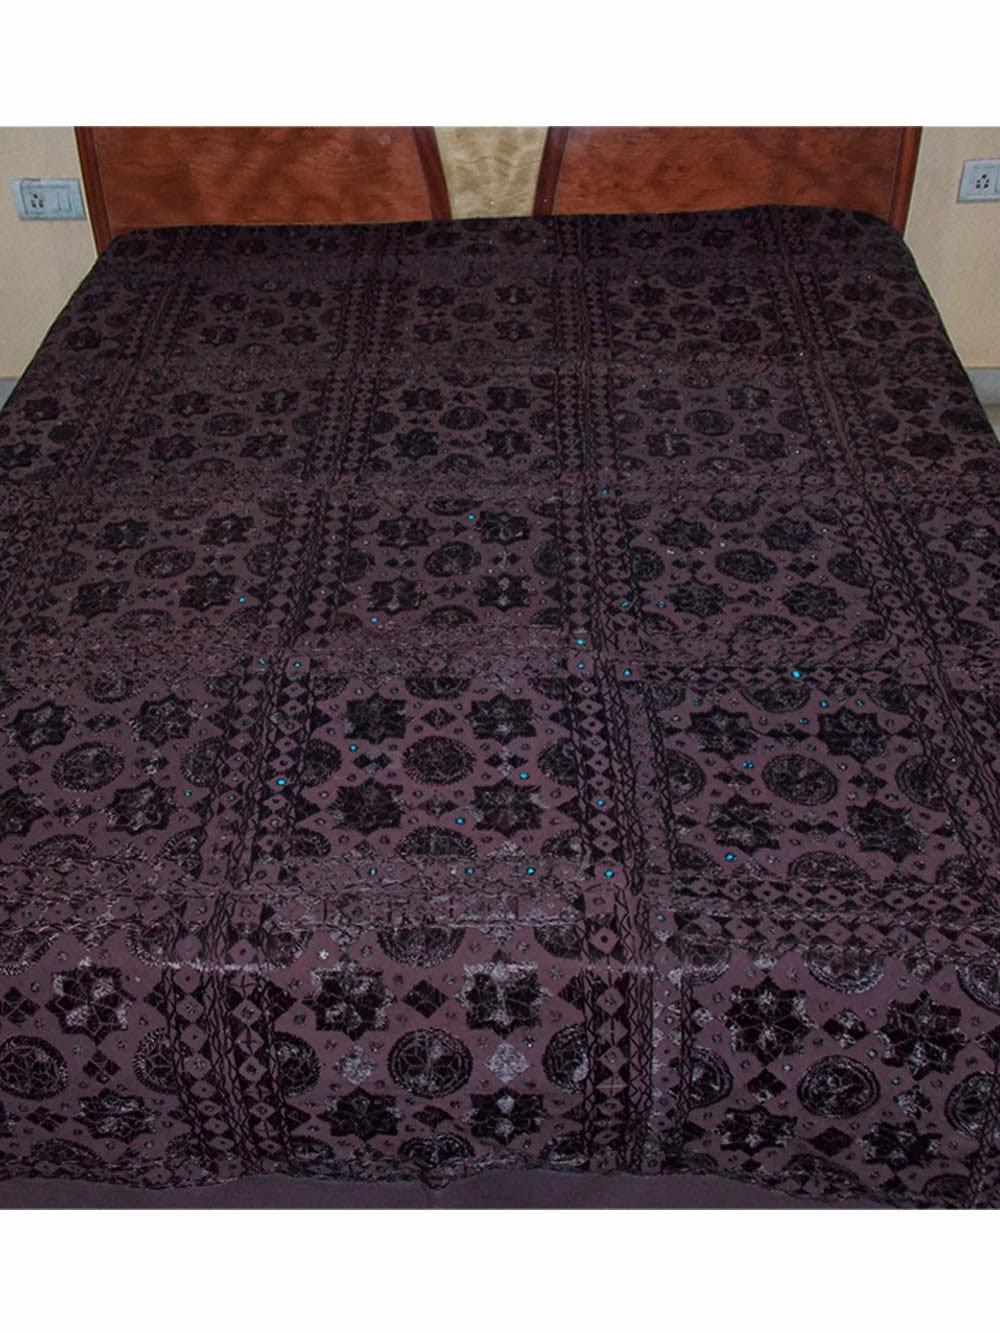 Handemade Sanganeri Bed Sheets Coverlets Bedspread